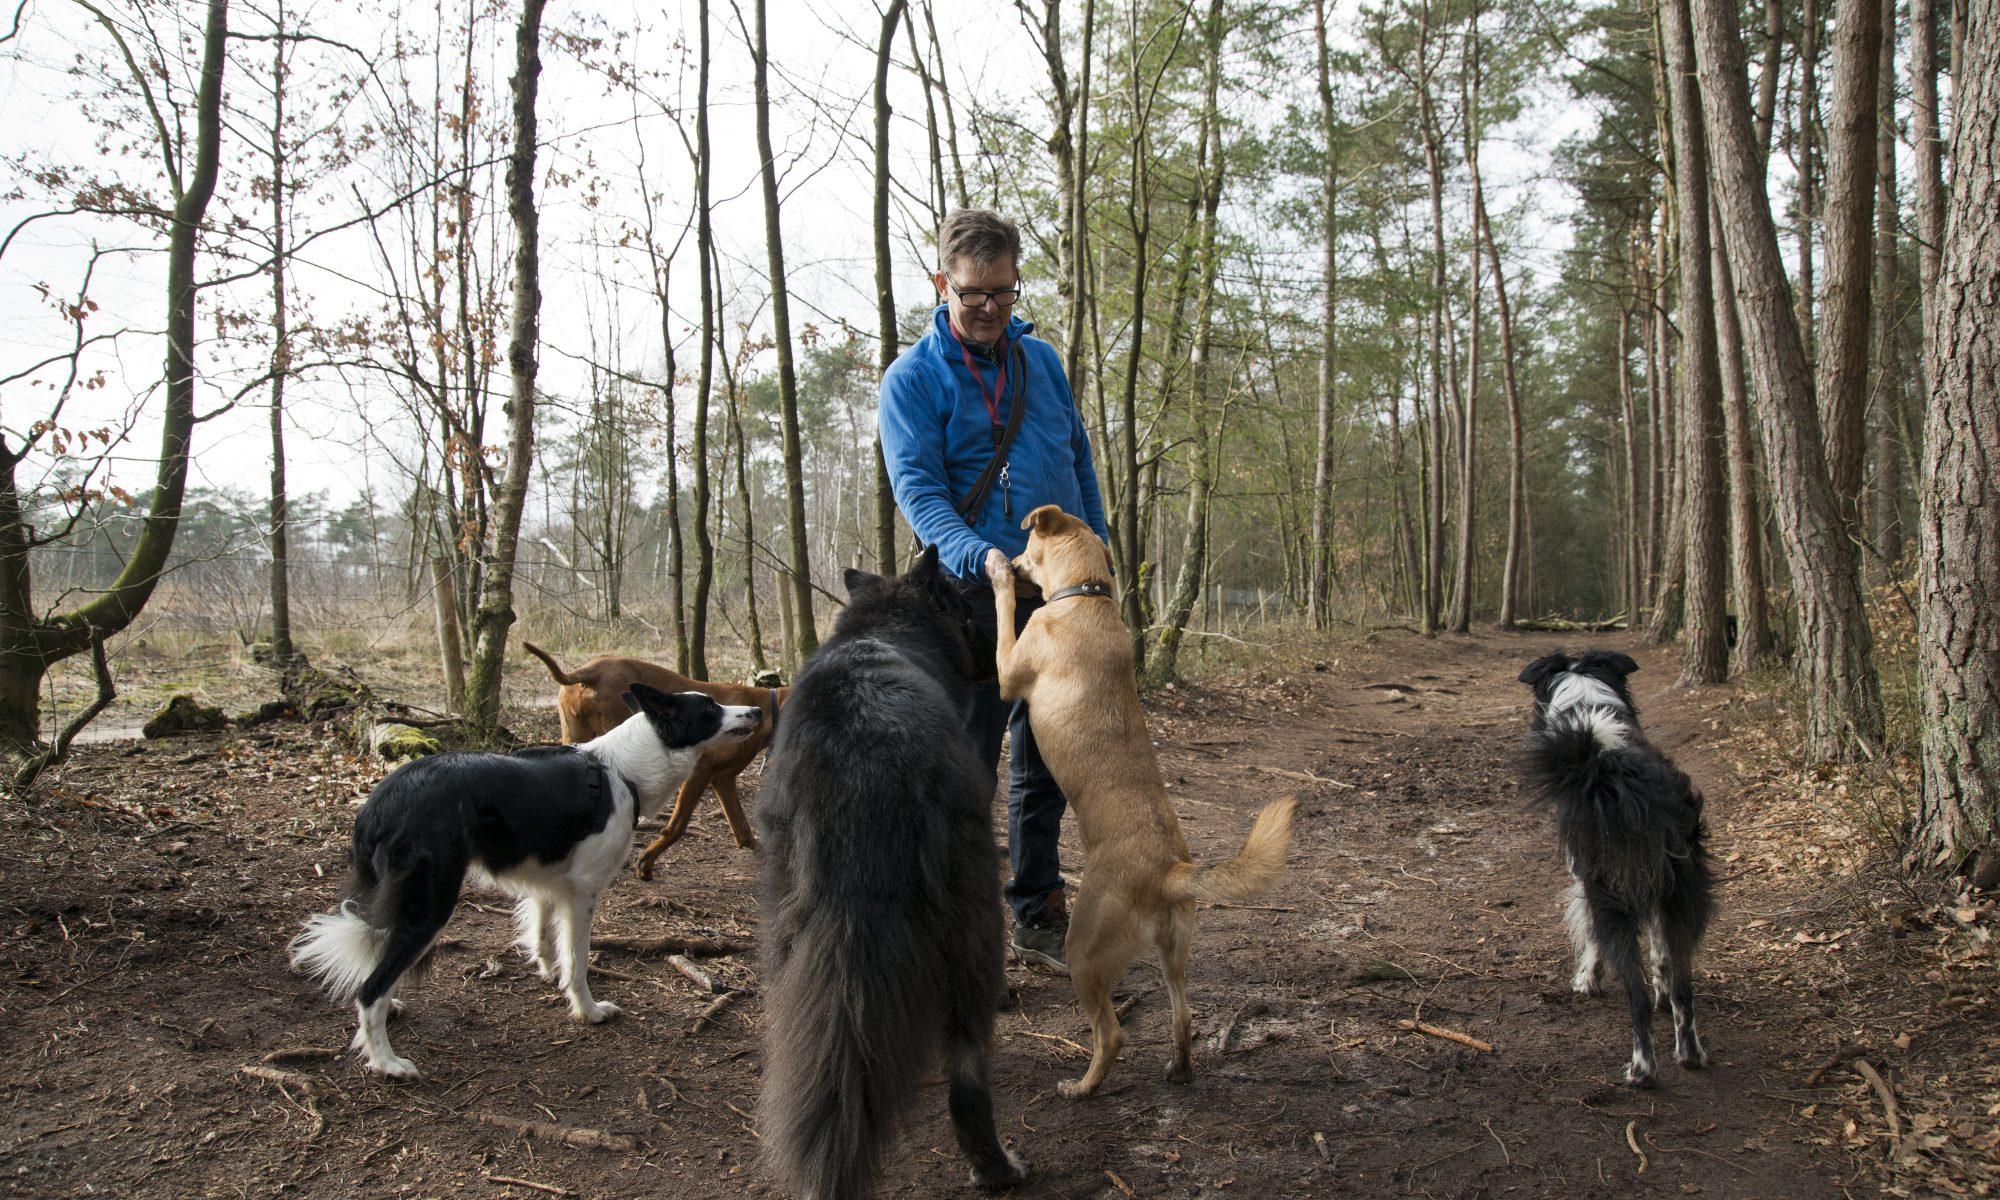 Hondenuitlaatservice in Apeldoorn en omstreken - Mee met Hans